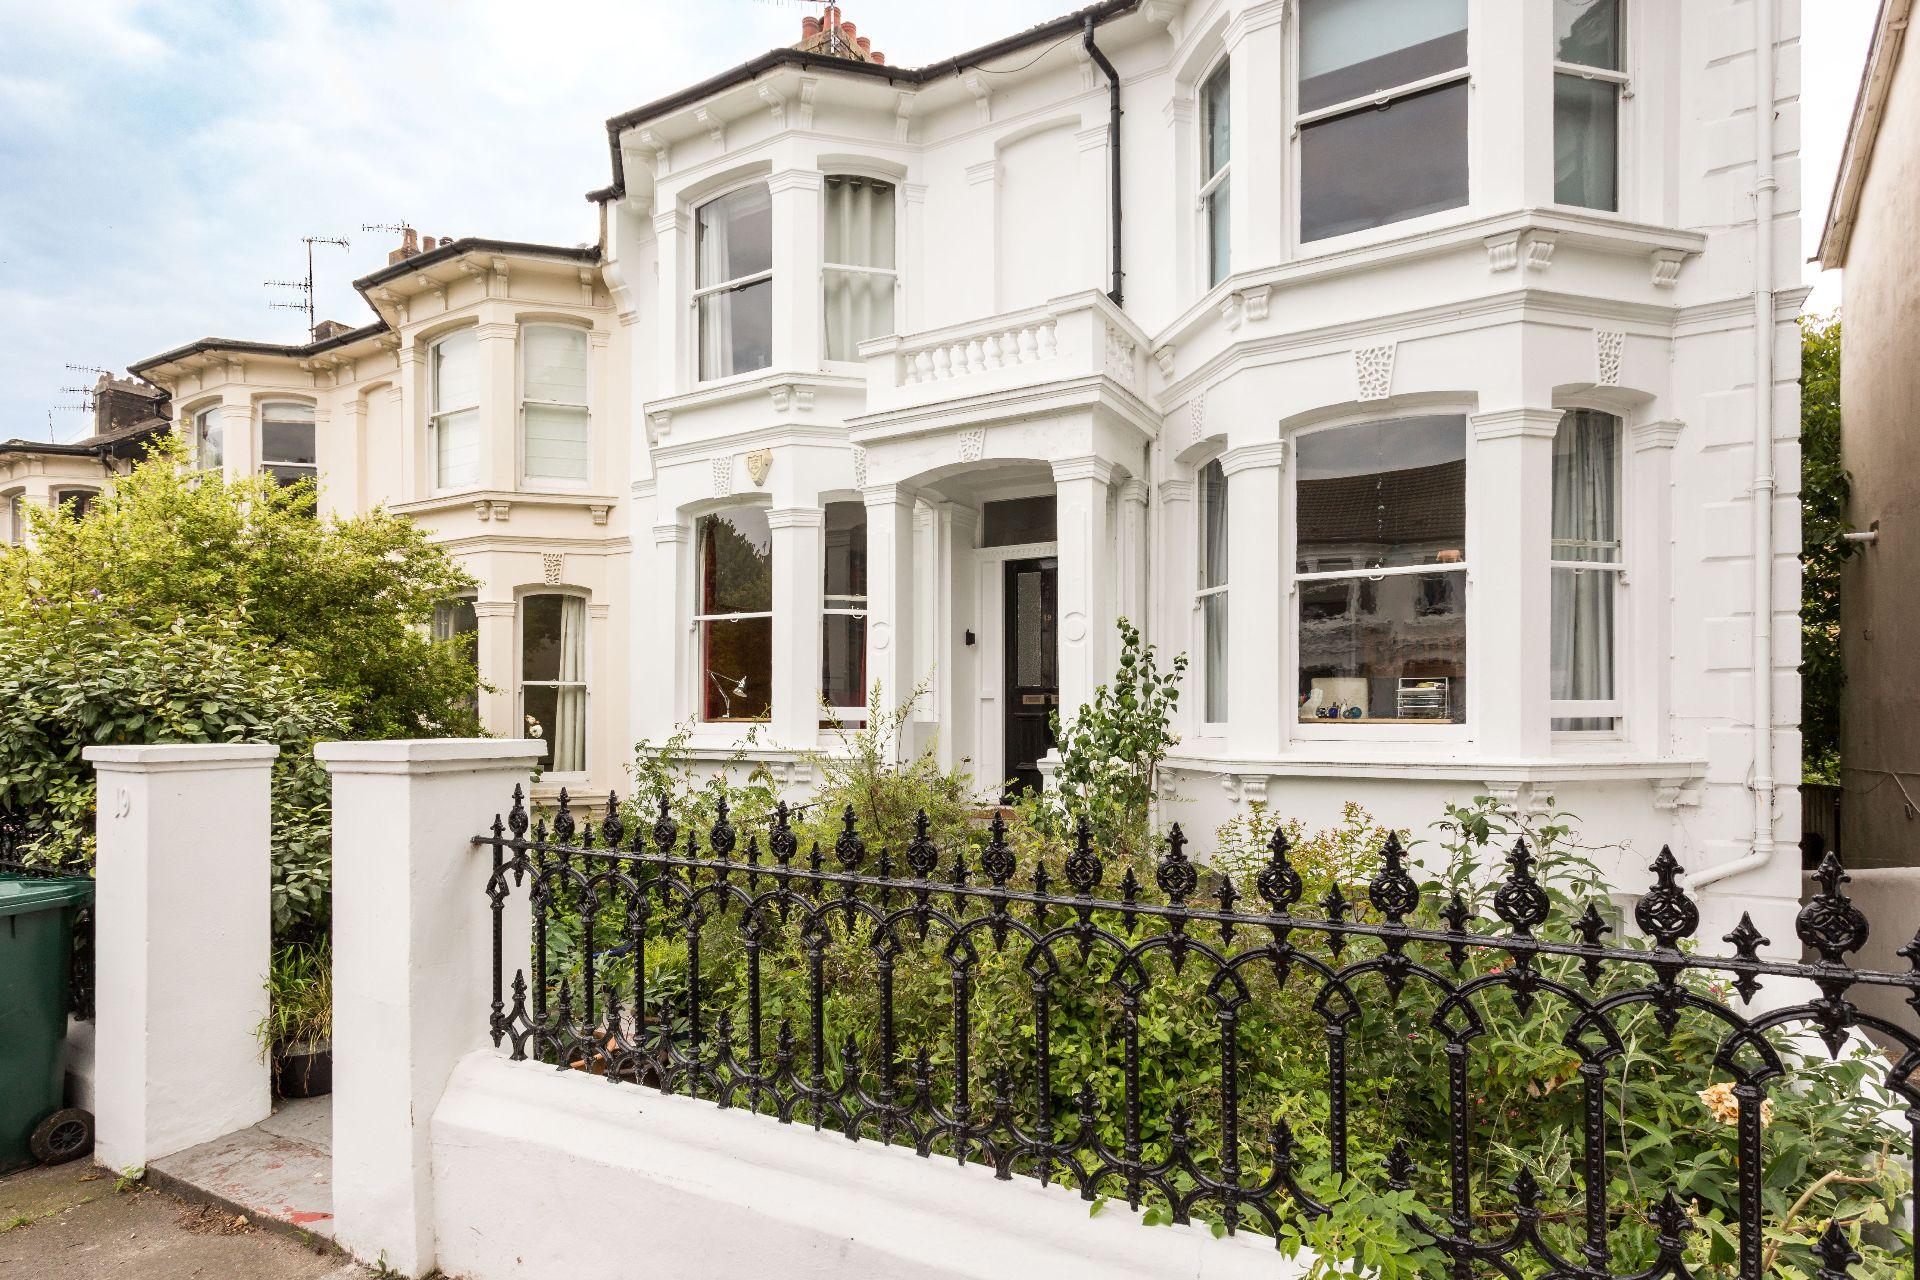 Beaconsfield Villas, Golden Triangle, Brighton